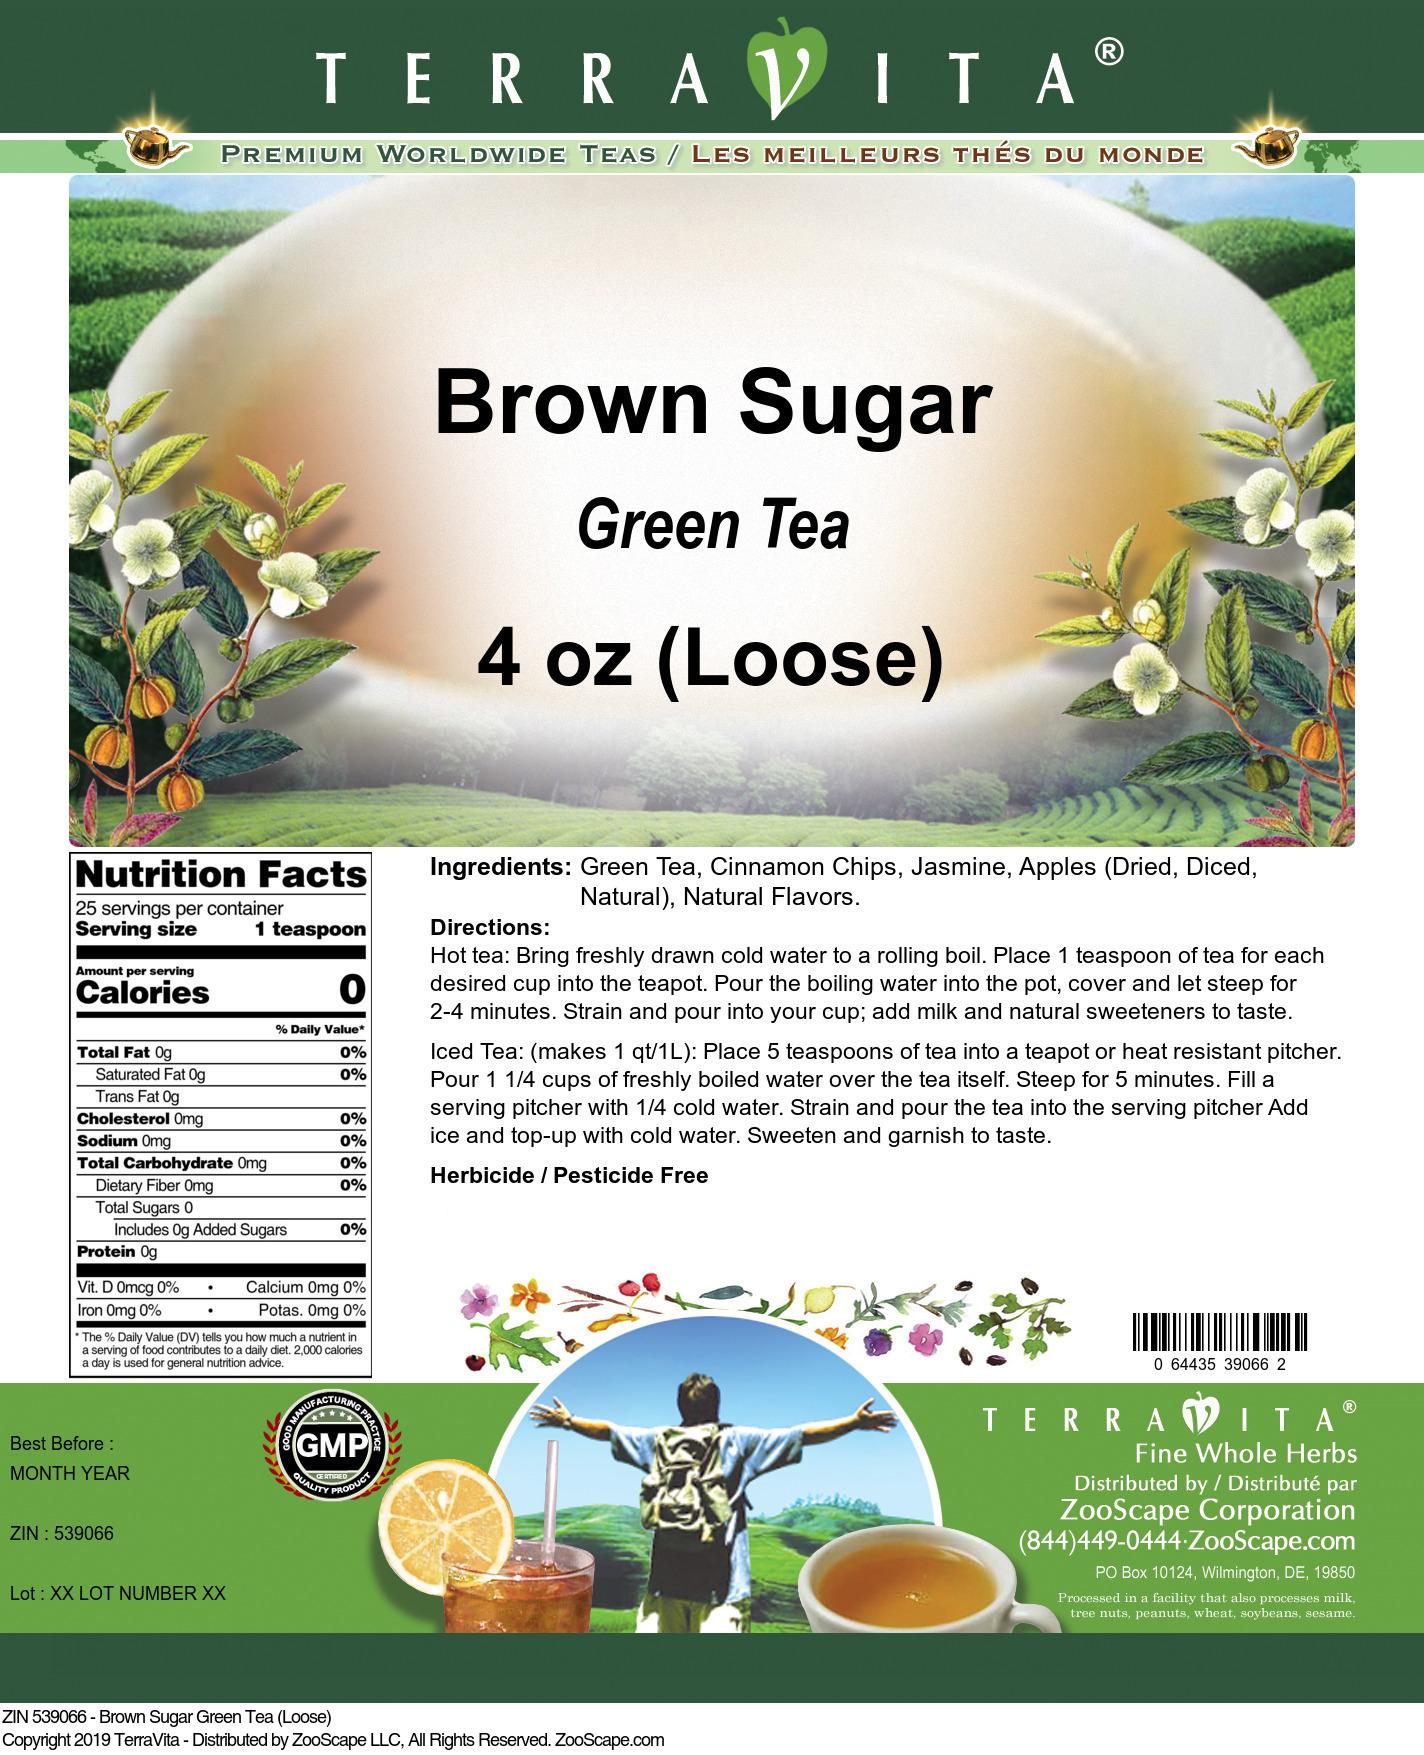 Brown Sugar Green Tea (Loose)